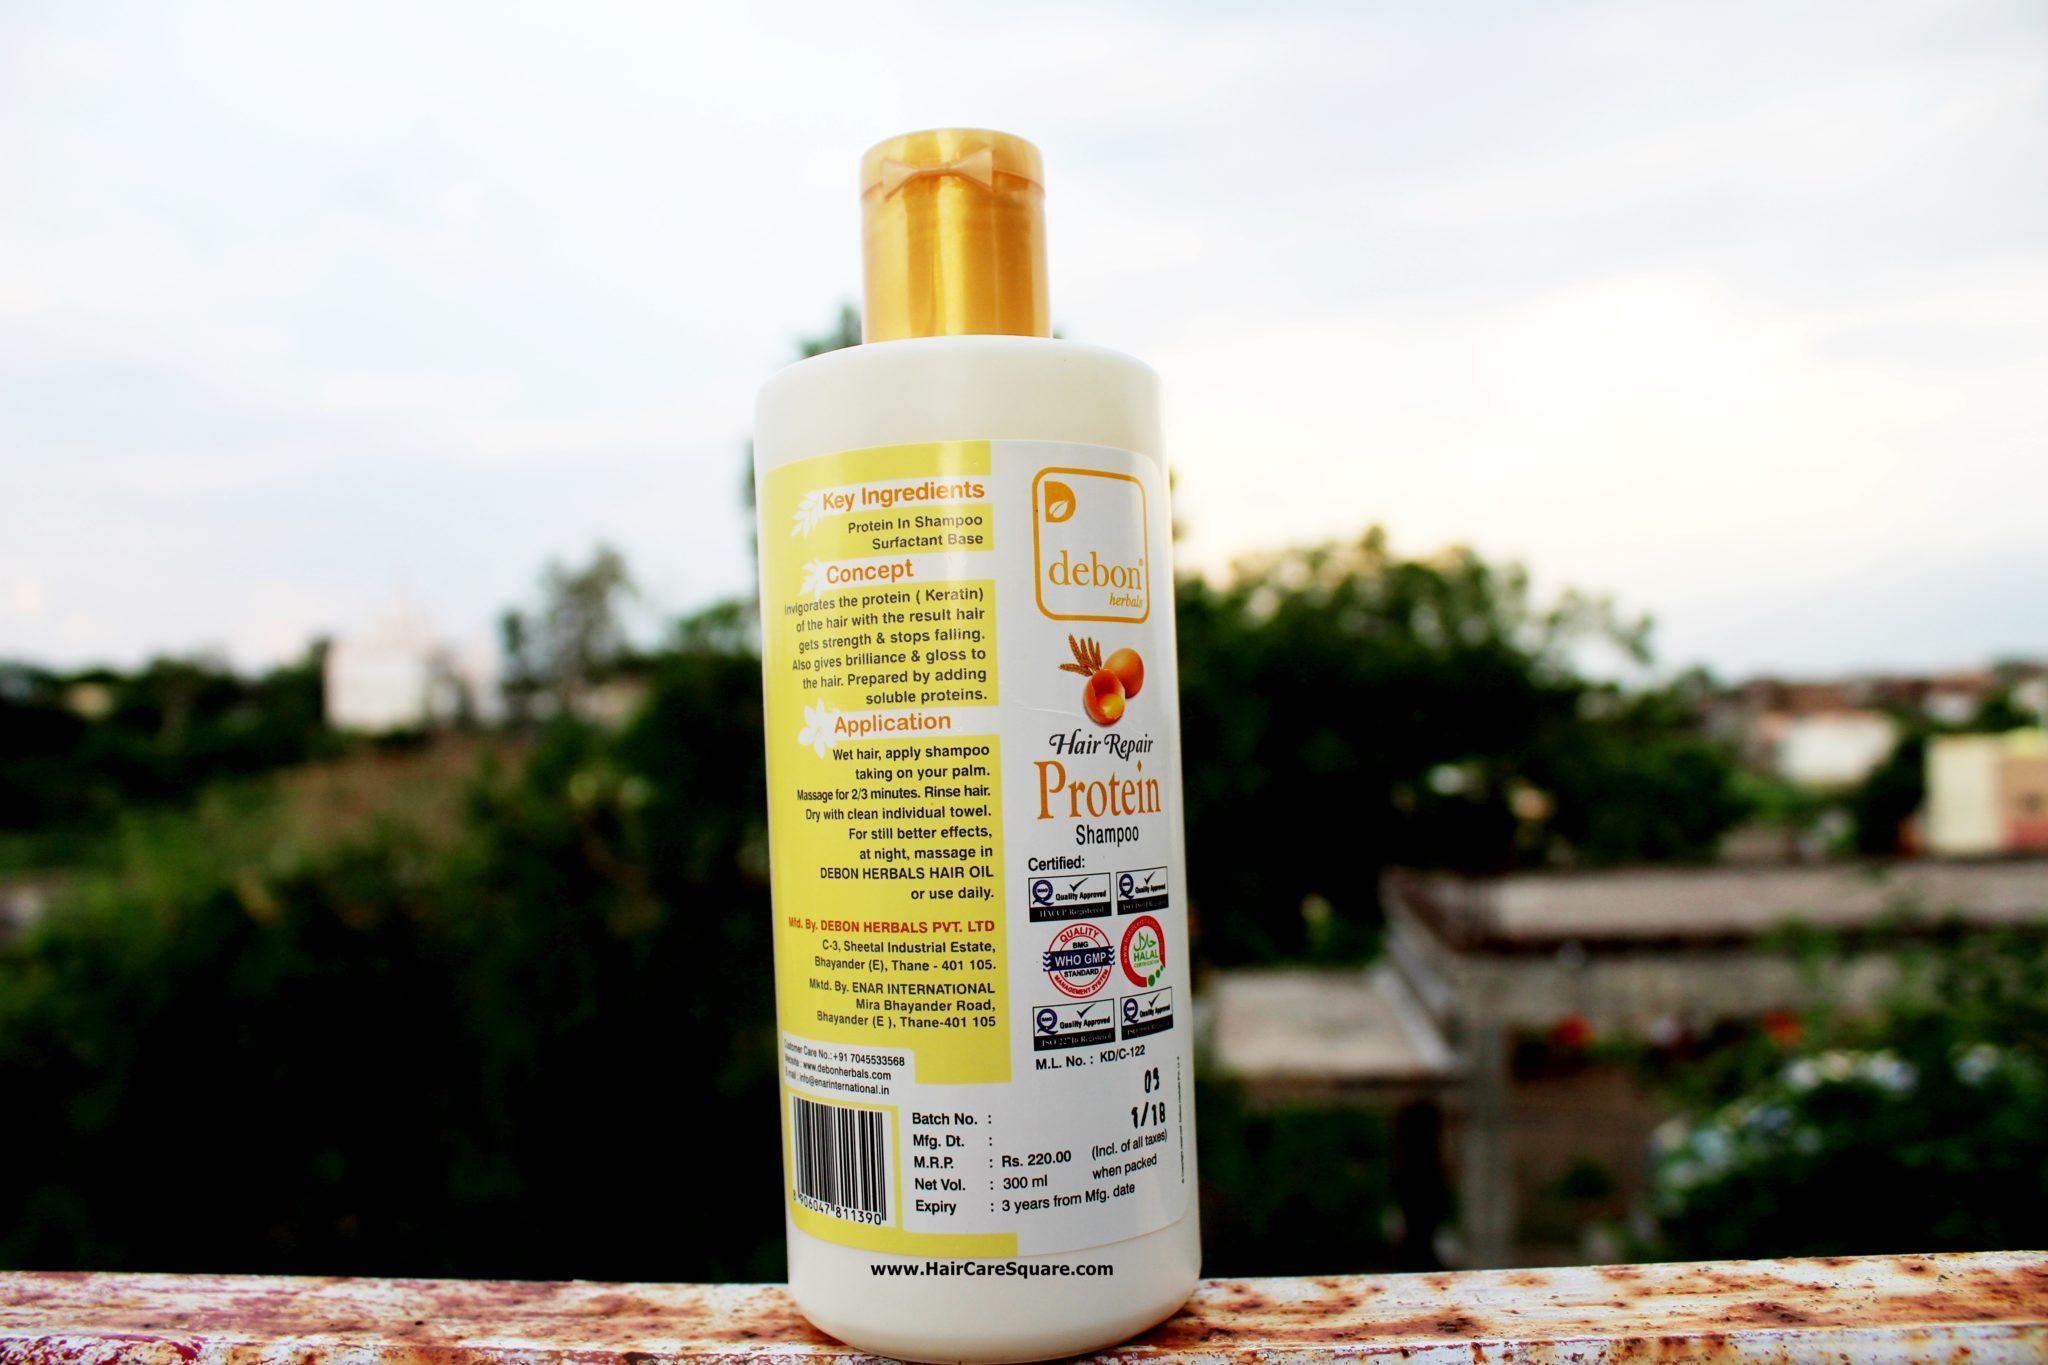 Debon Herbals protein shampoo review